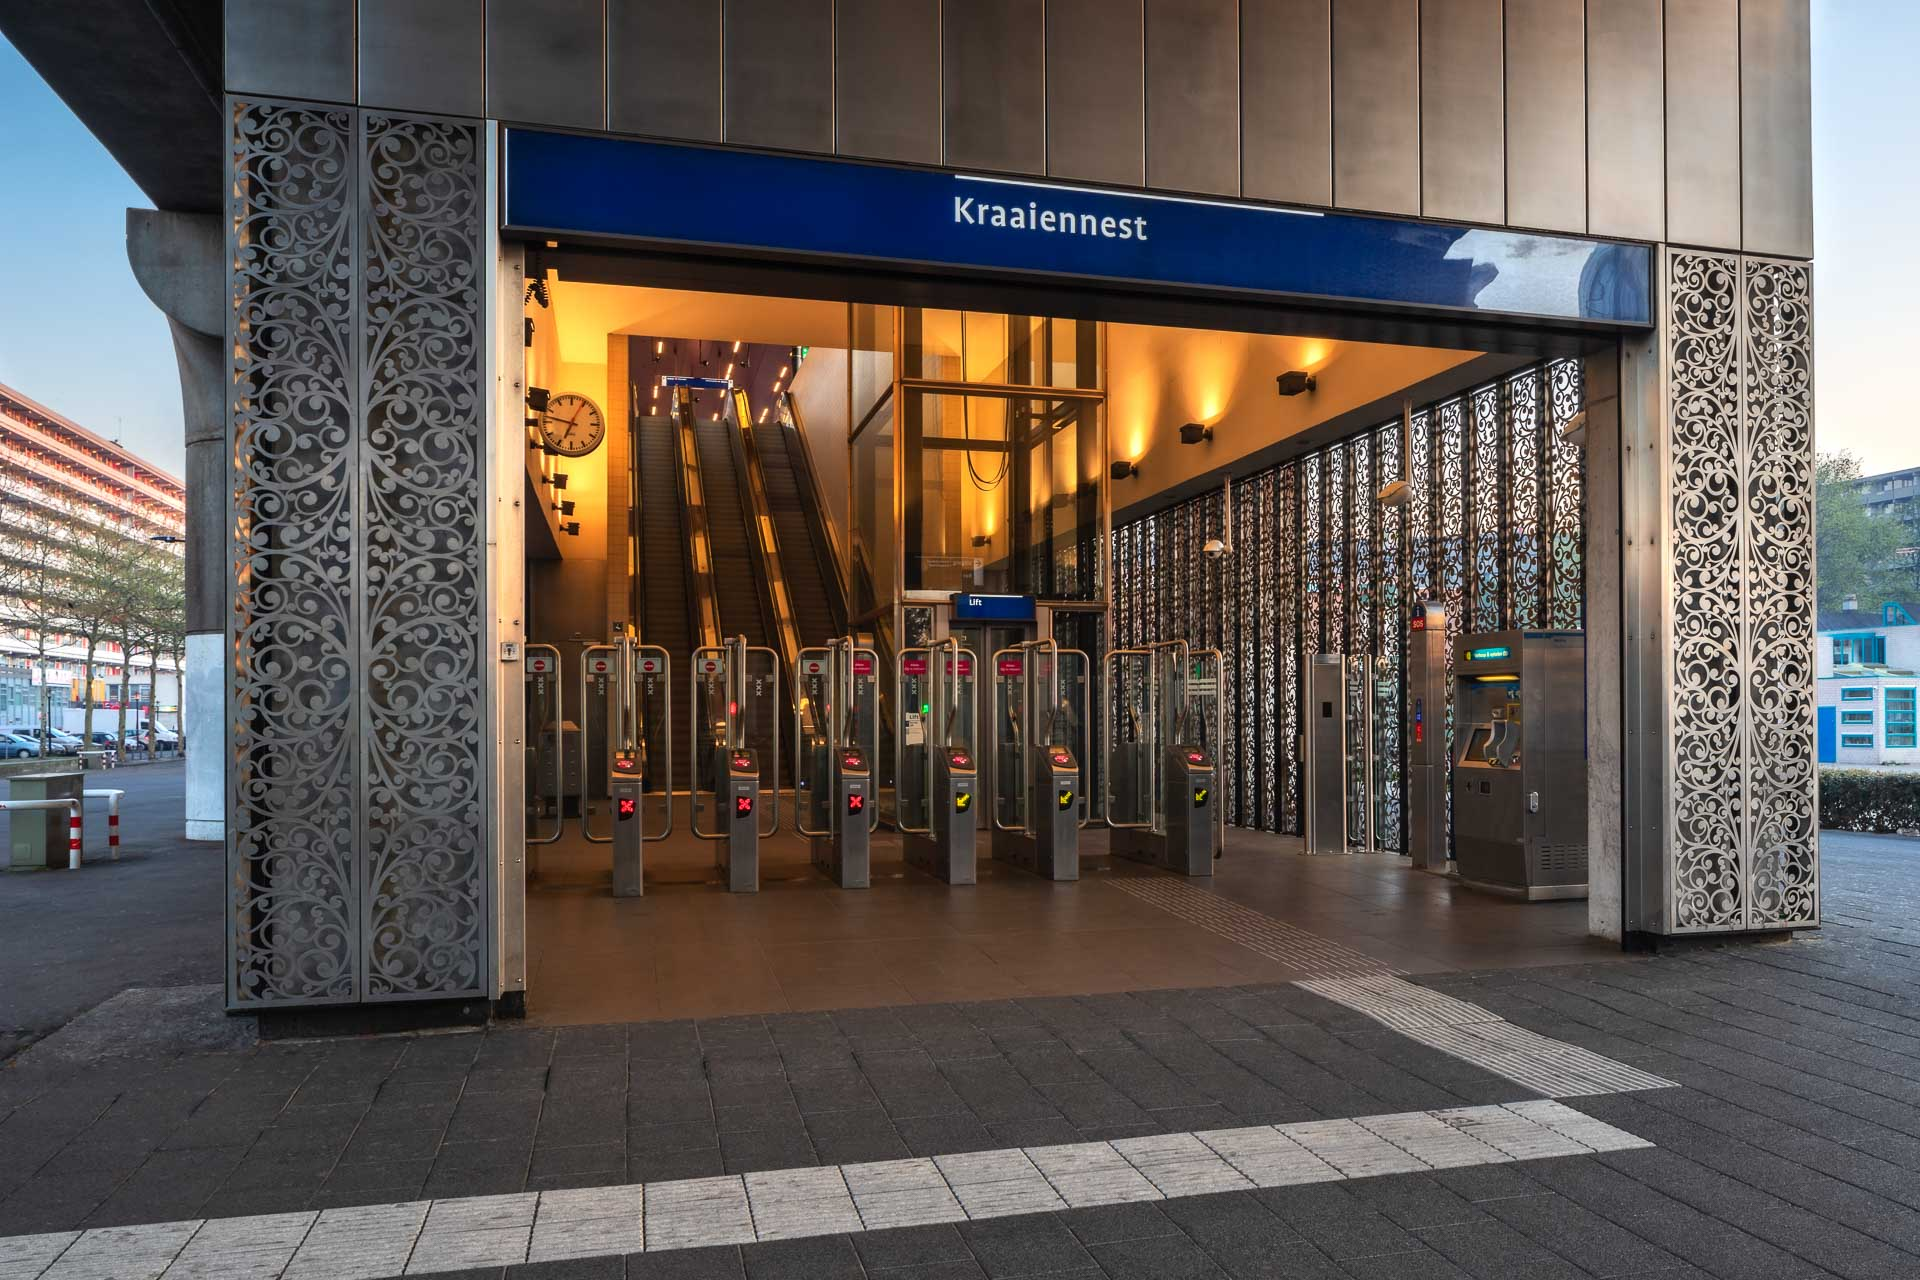 Metrostation Kraaiennest